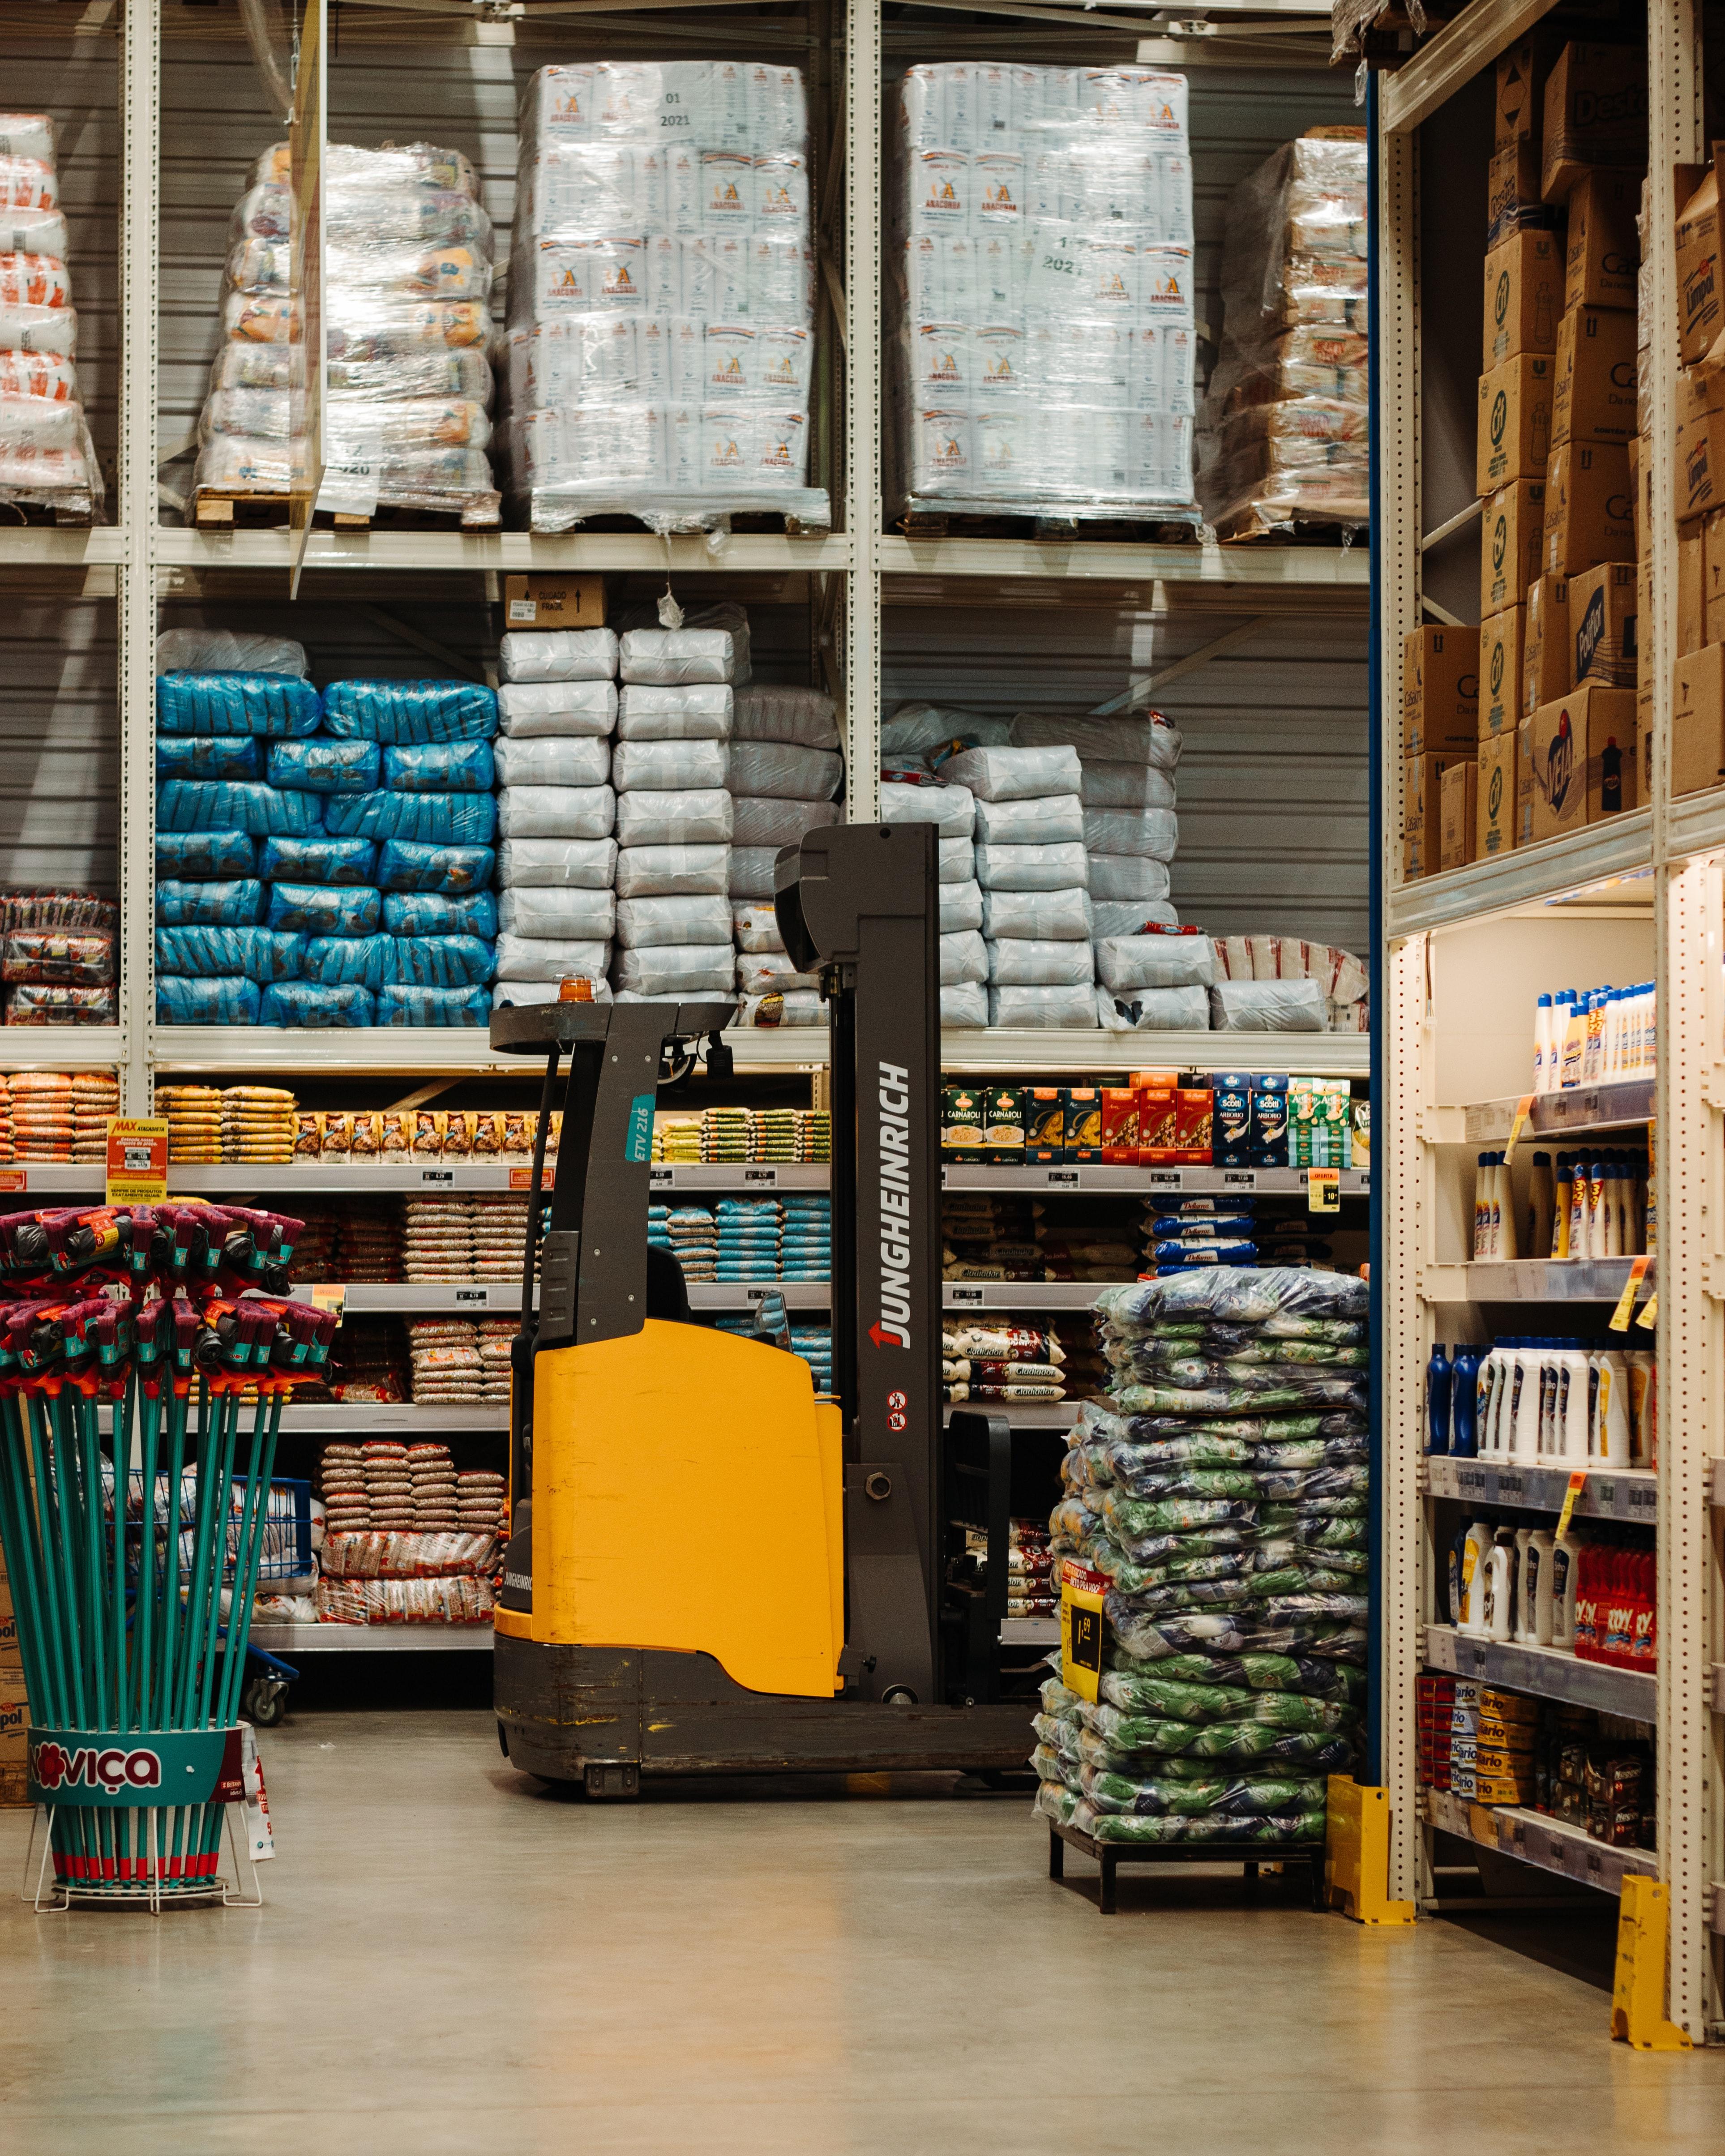 Benefits Of Bonded Storage